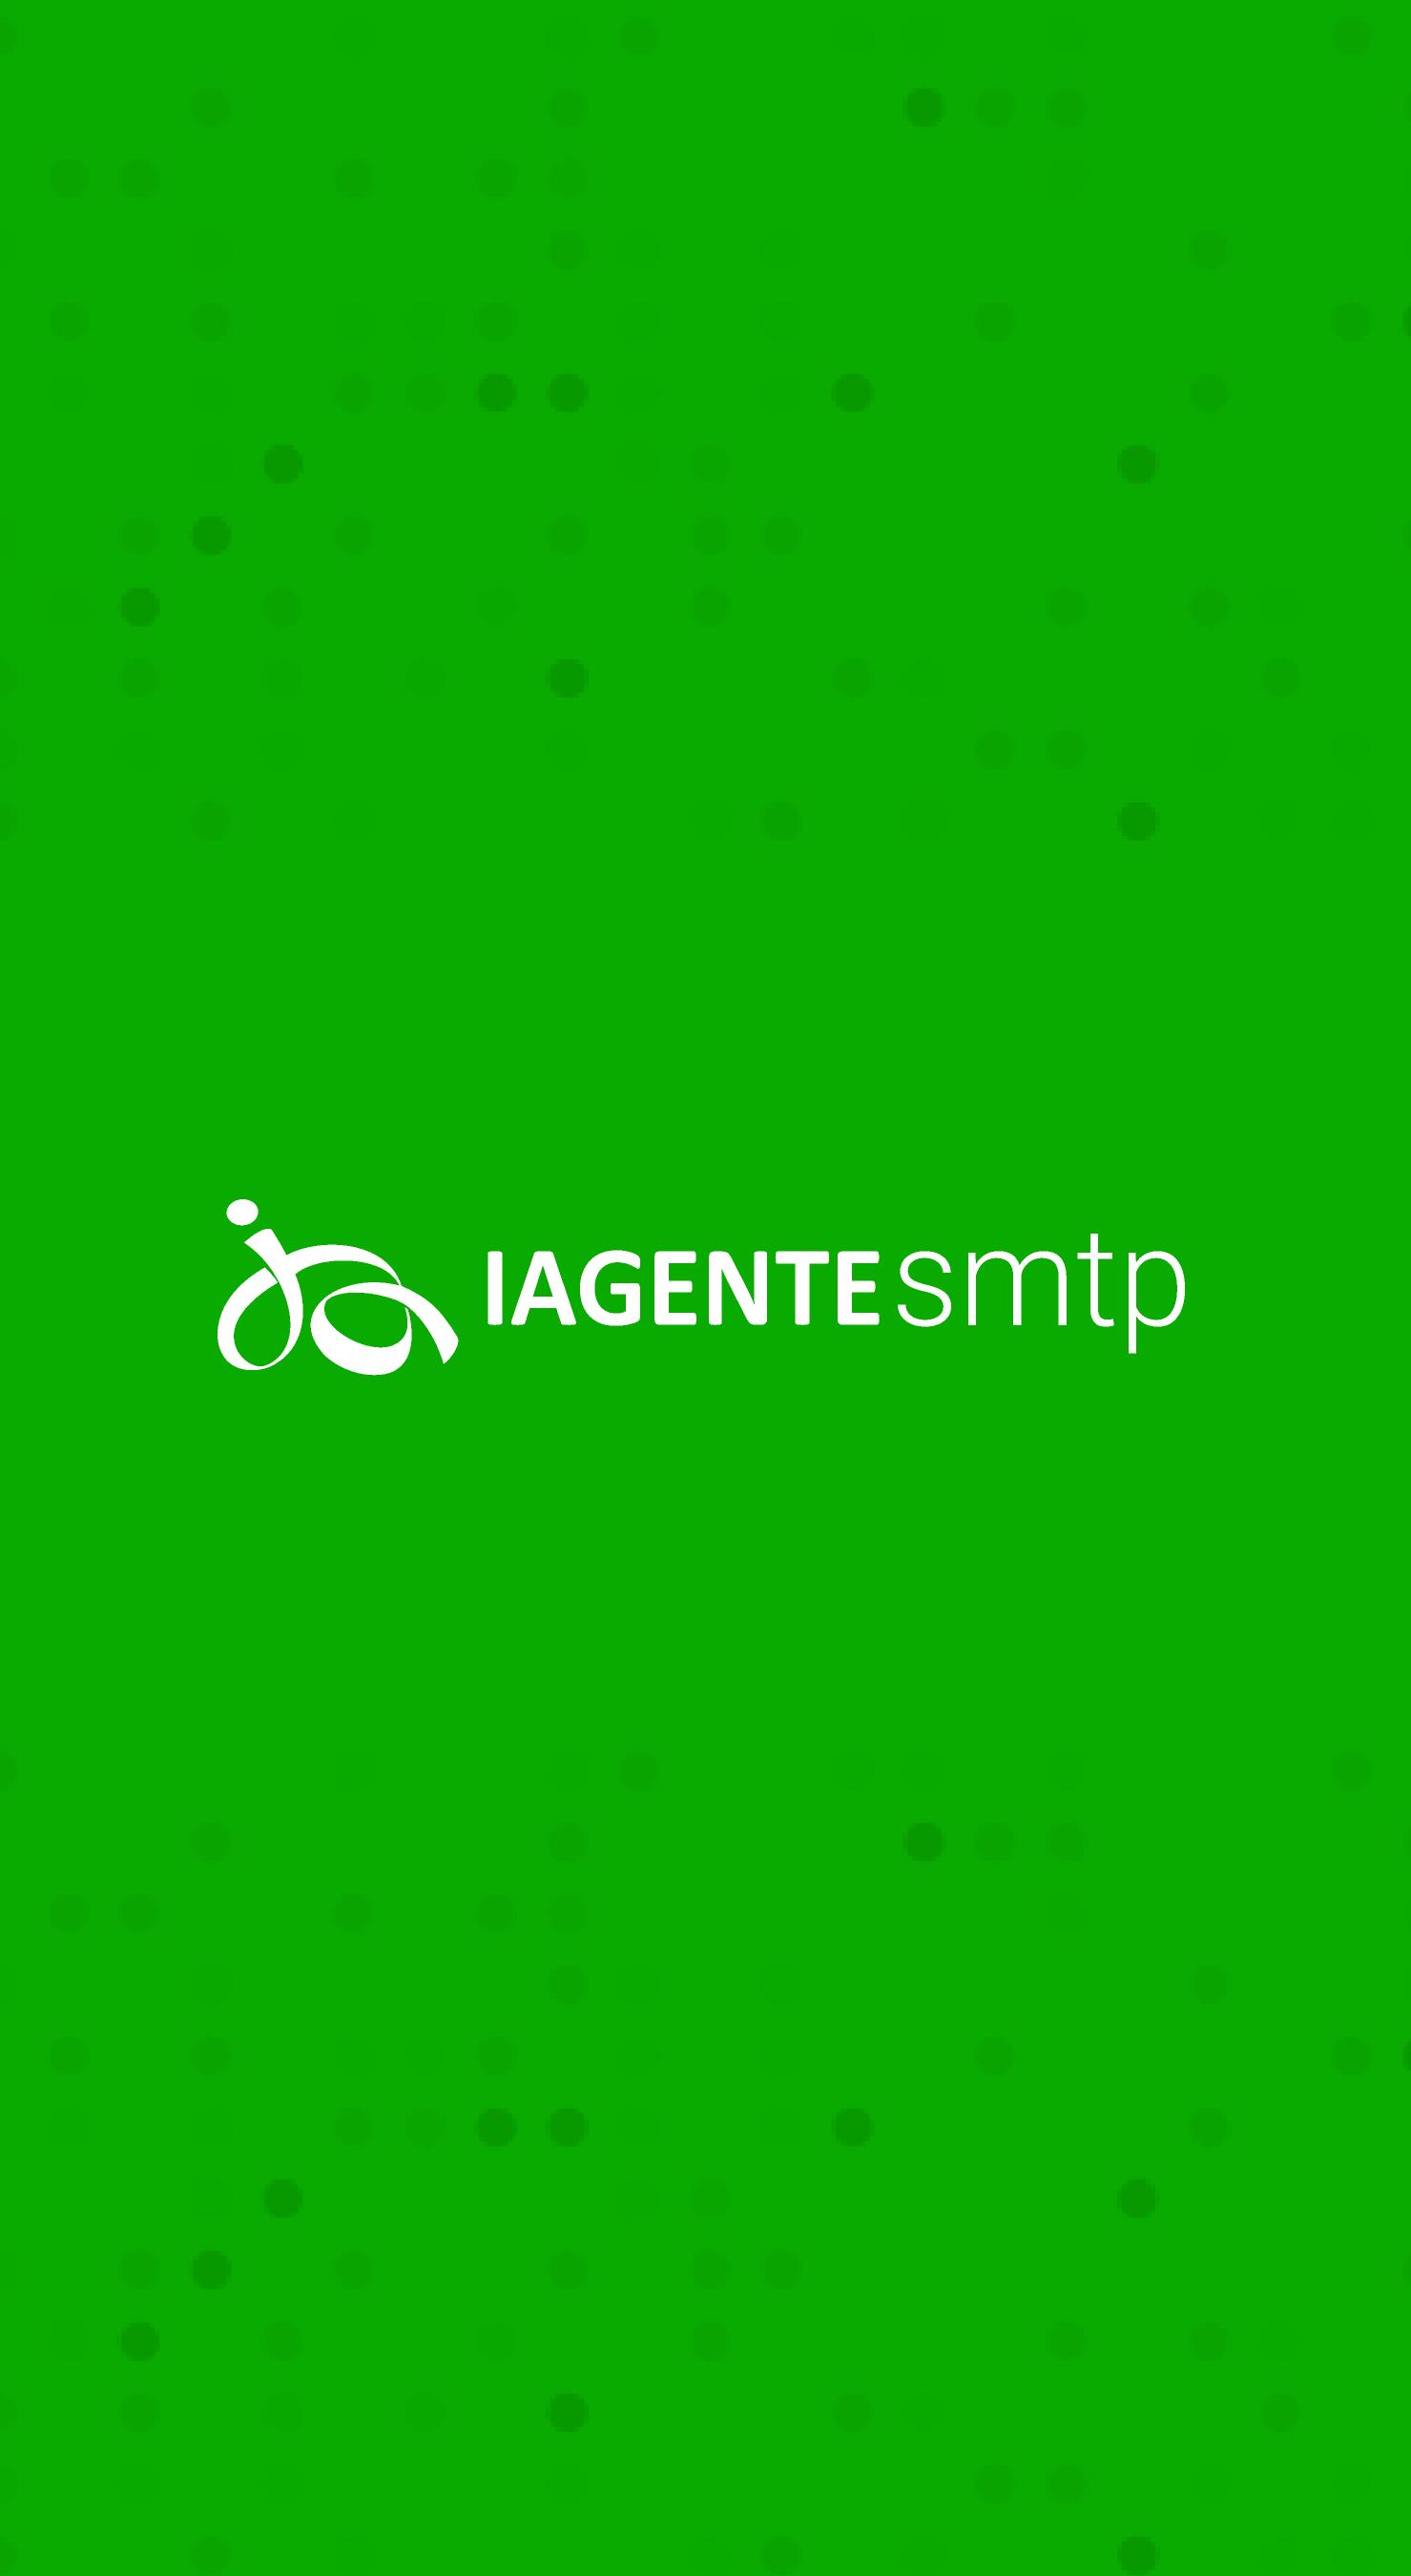 IAGENTEsmtp - Lateral